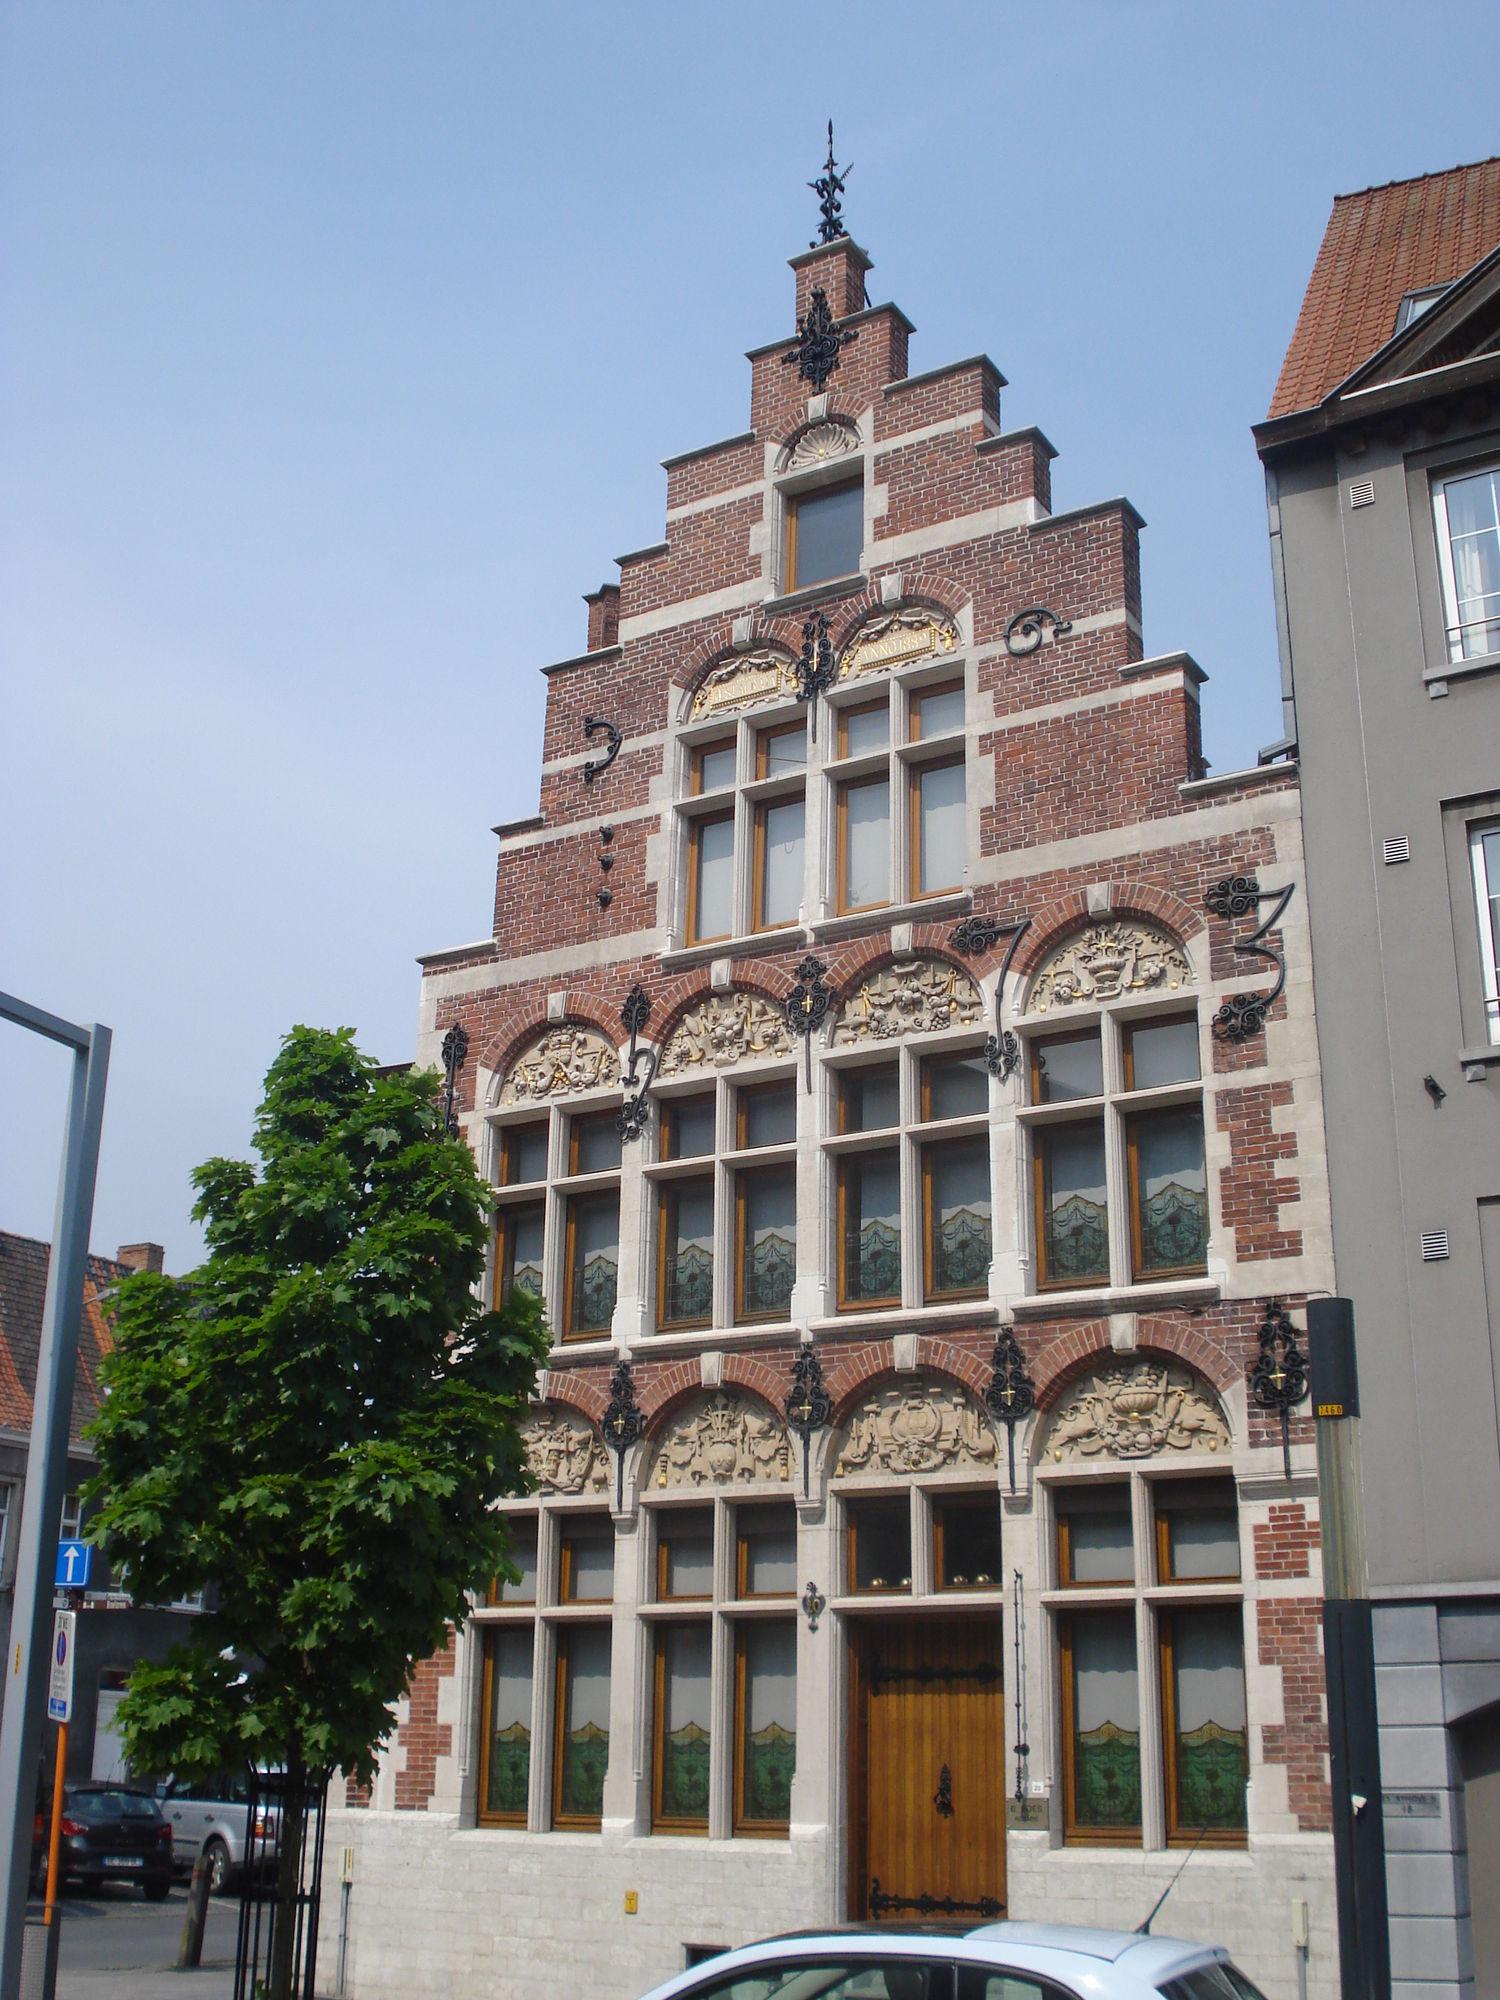 9. Rijselsestraat